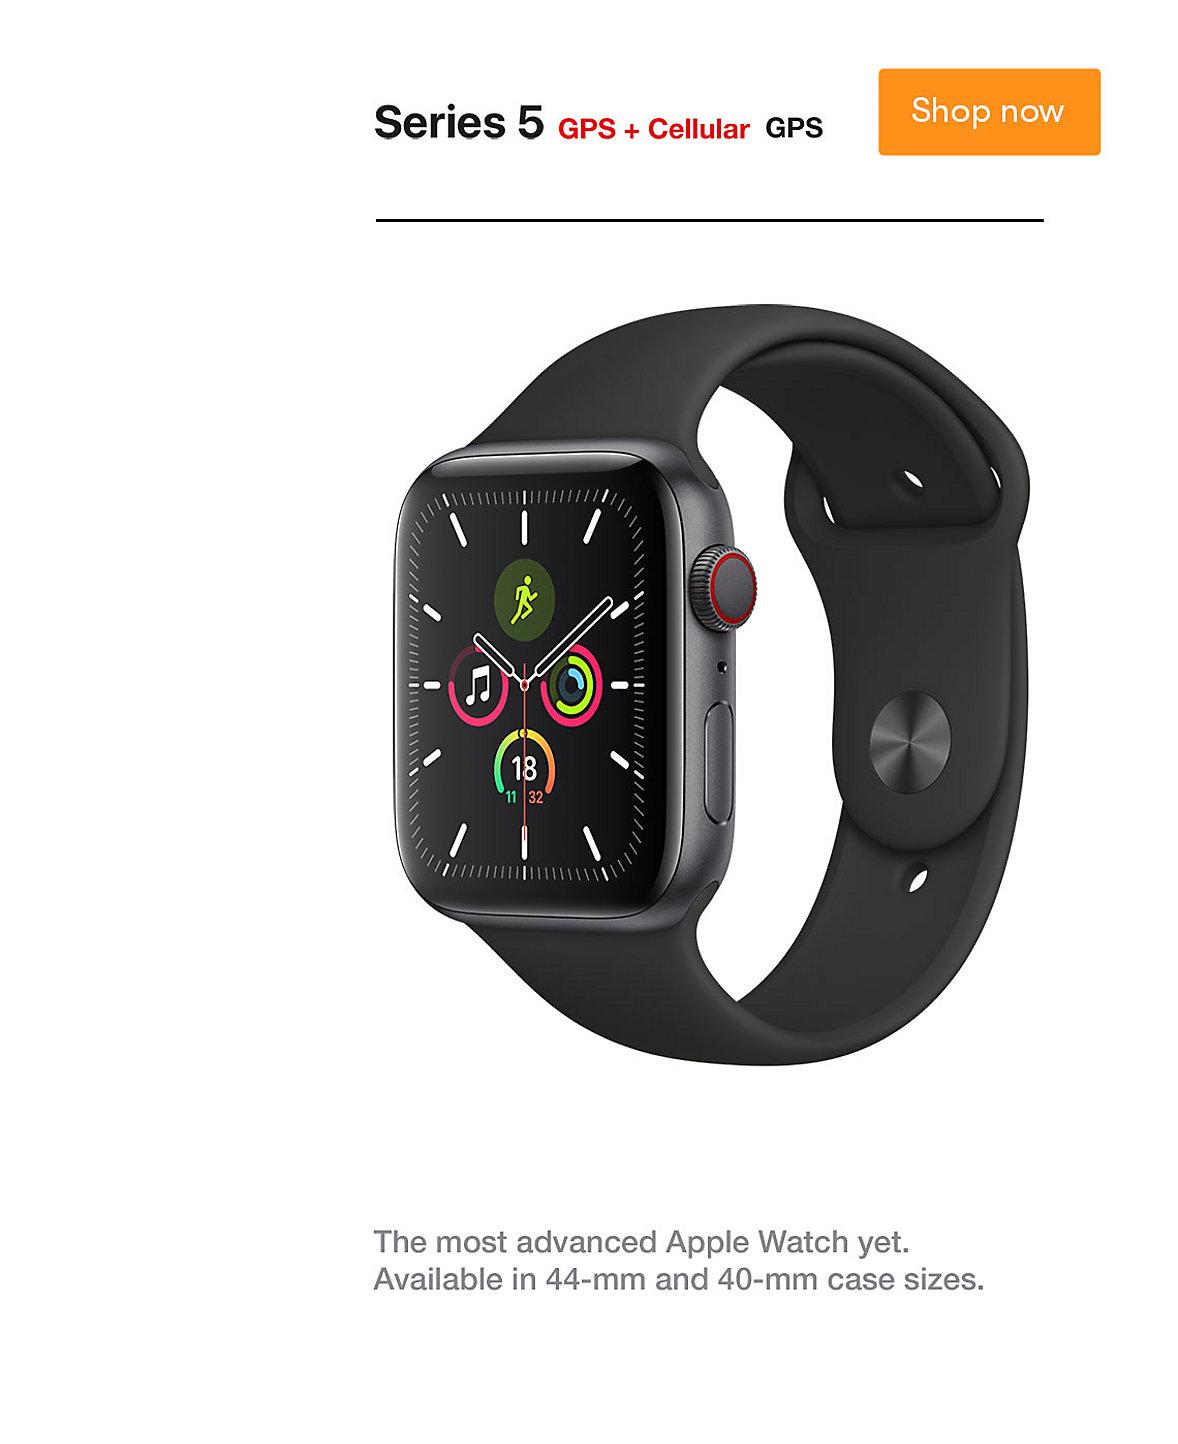 Apple Watch Series 5 GPS Cellular Shop Now